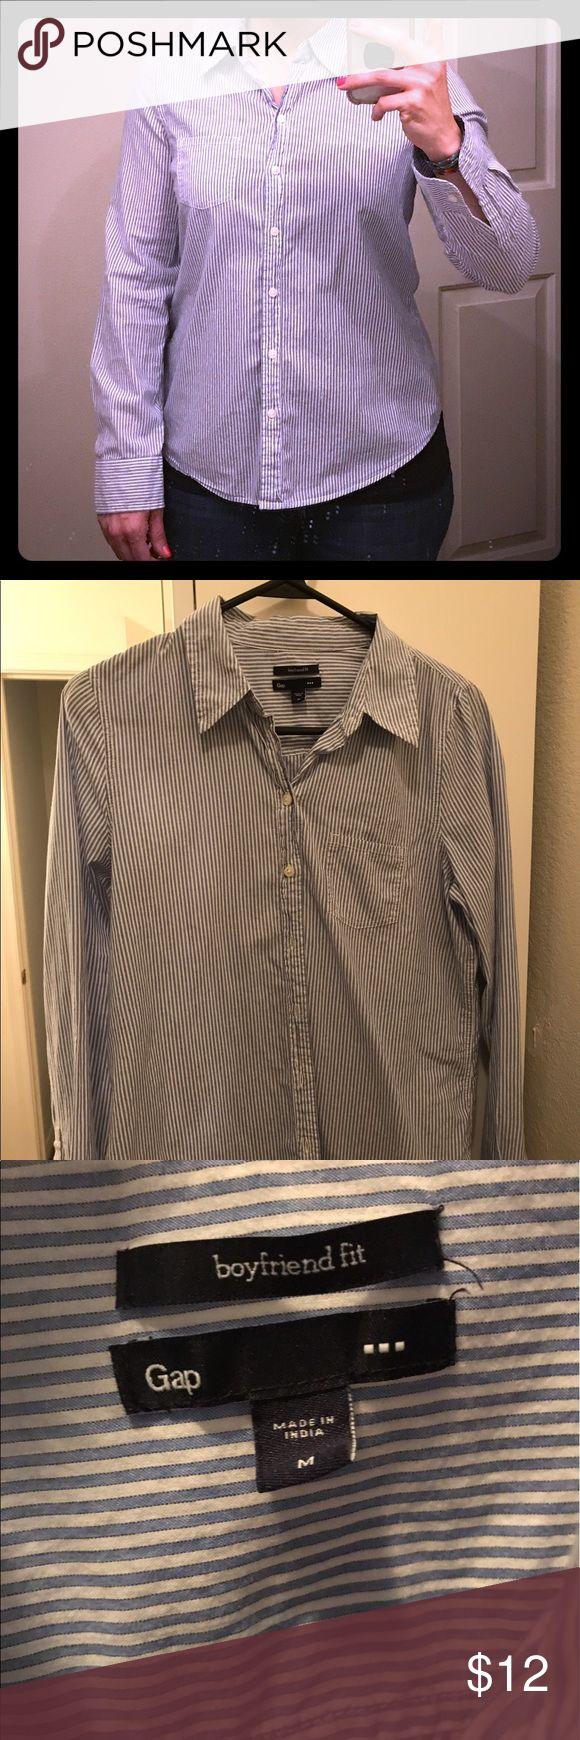 Women's Gap button down shirt GAP Women's Medium. Boyfriend fit. Blue and white striped button down shirt. GAP Tops Button Down Shirts